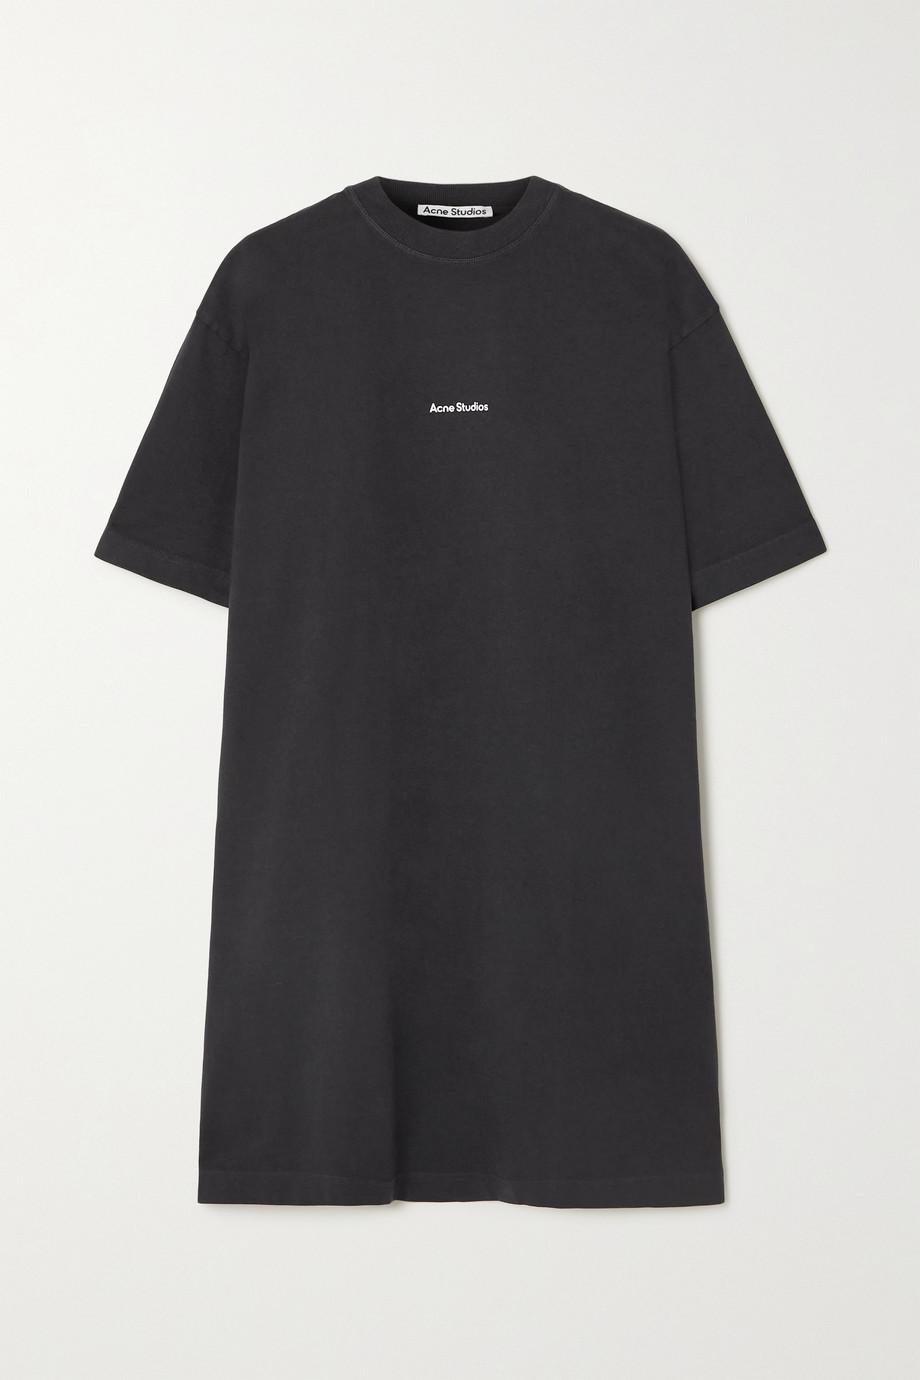 Acne Studios Mini-robe en jersey de coton biologique imprimé - NET SUSTAIN